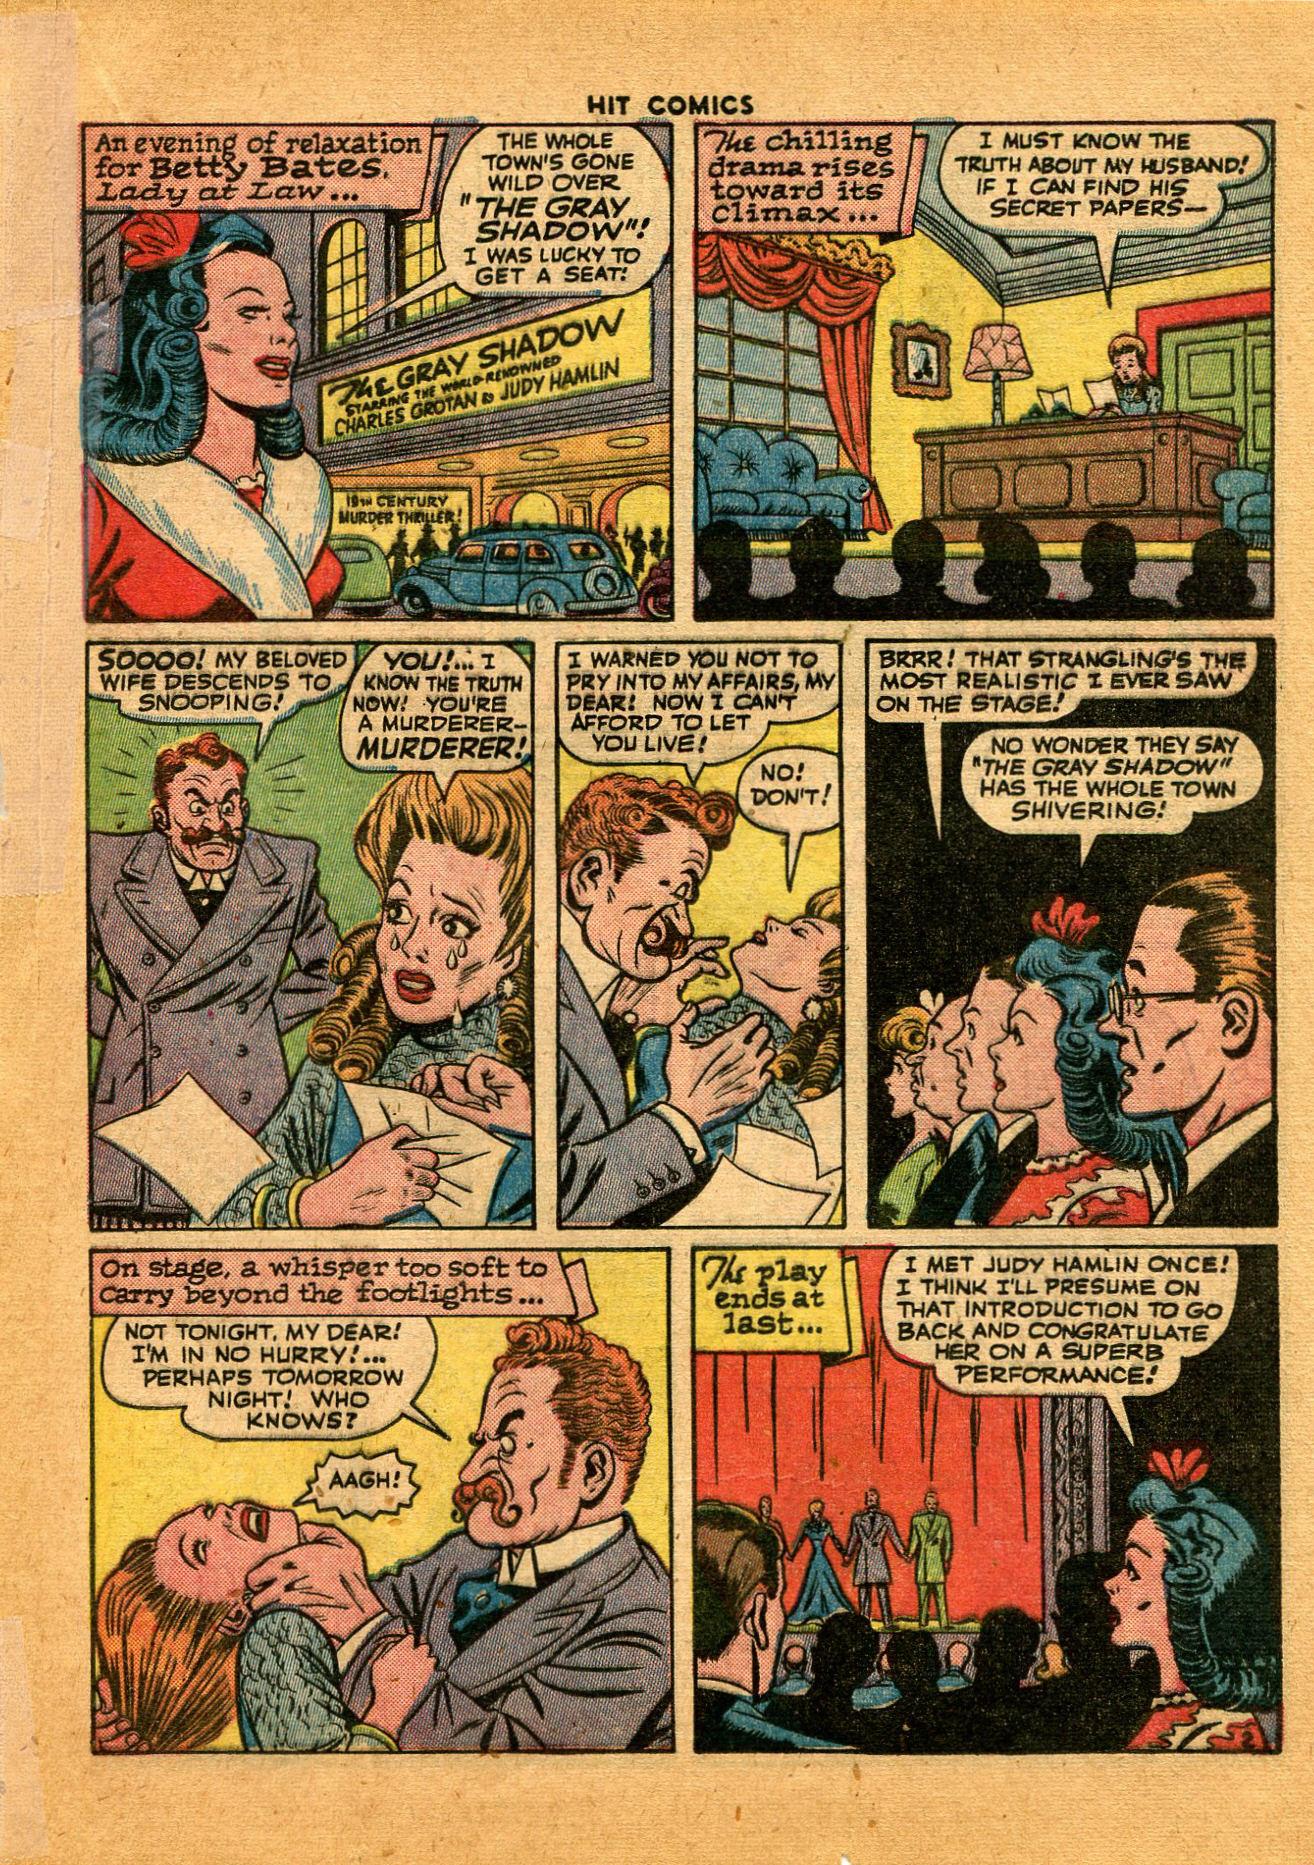 Read online Hit Comics comic -  Issue #35 - 31